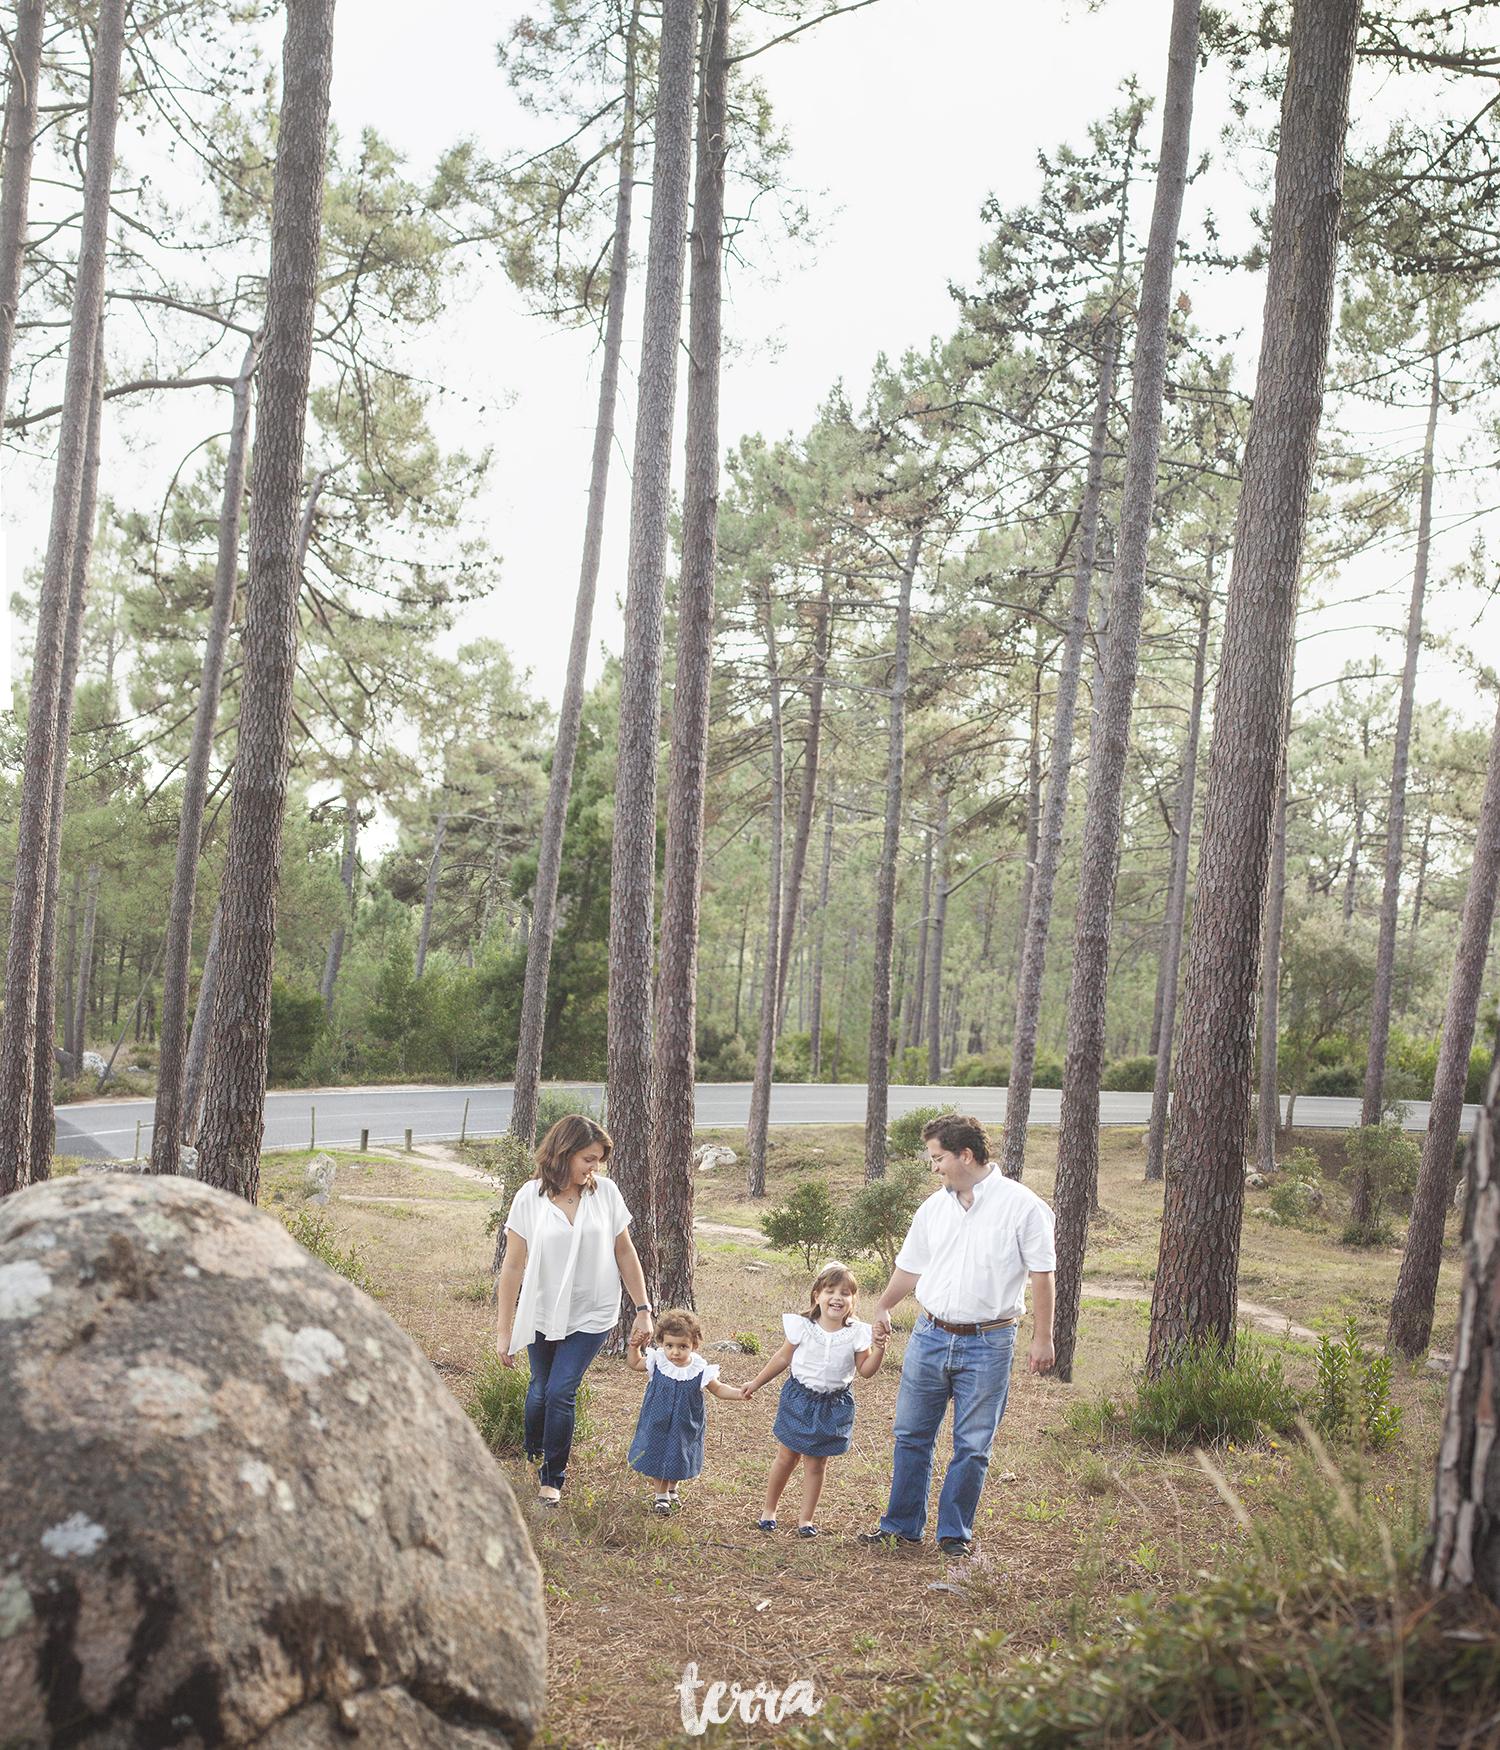 sessao-fotografica-familia-serra-sintra-portugal-terra-fotografia-01.jpg